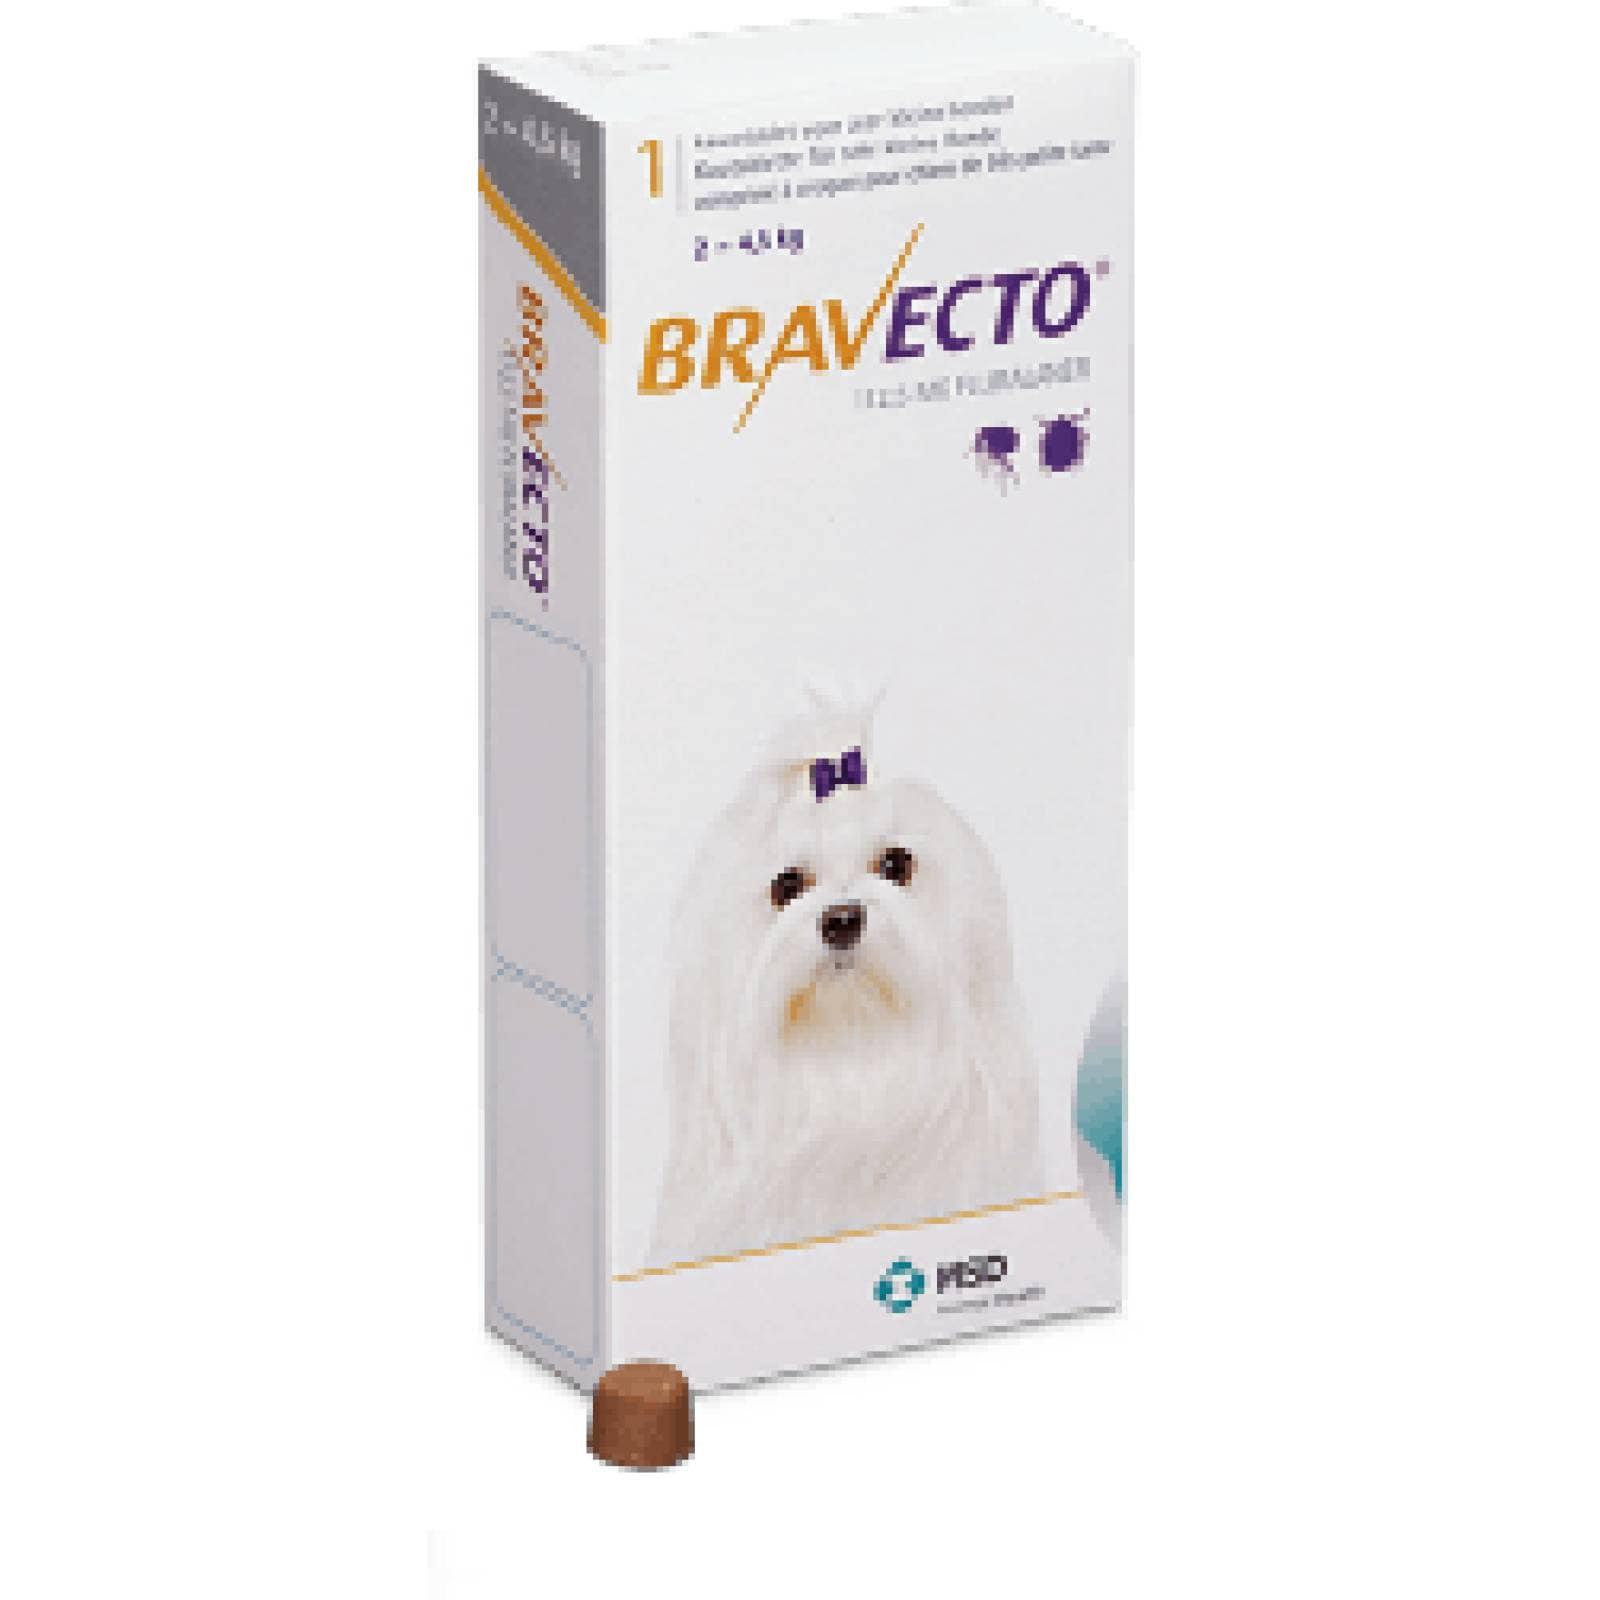 Bravecto Desparacitante para Perro Raza Mini de 2-4.5 kg 1 comp de 112.5 mg